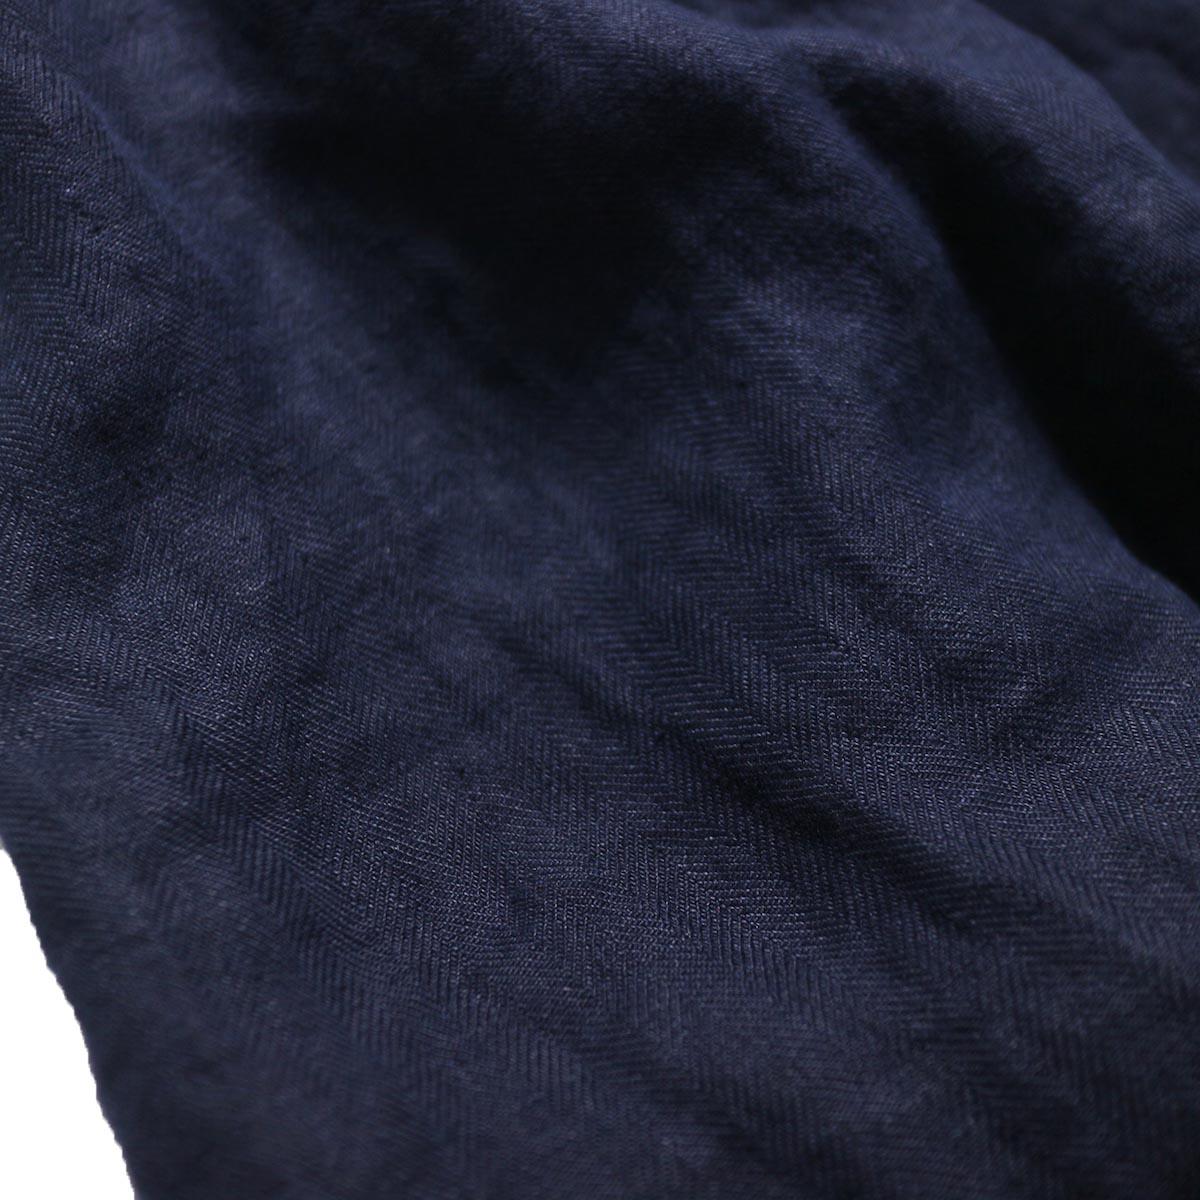 ARMEN / Apron One Piece -Marine 生地感